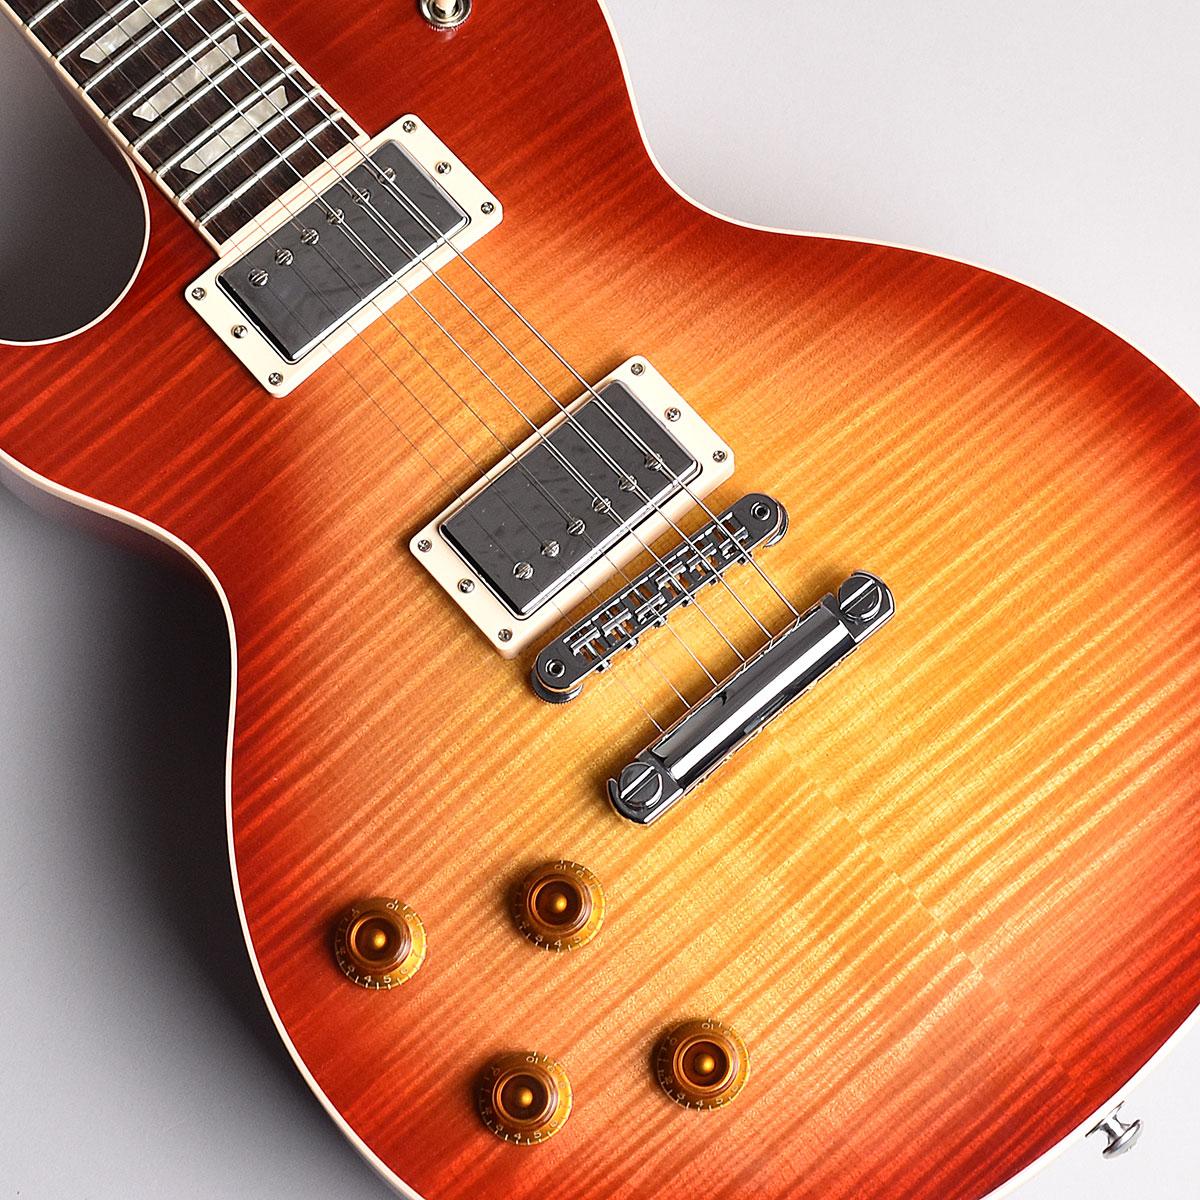 Gibson Les Paul Standard 2018 Left Hand Heritage Cherry Sunburst S/N:180025653 【レフトハンド】 【ギブソン】【イオンモール幕張新都心店】